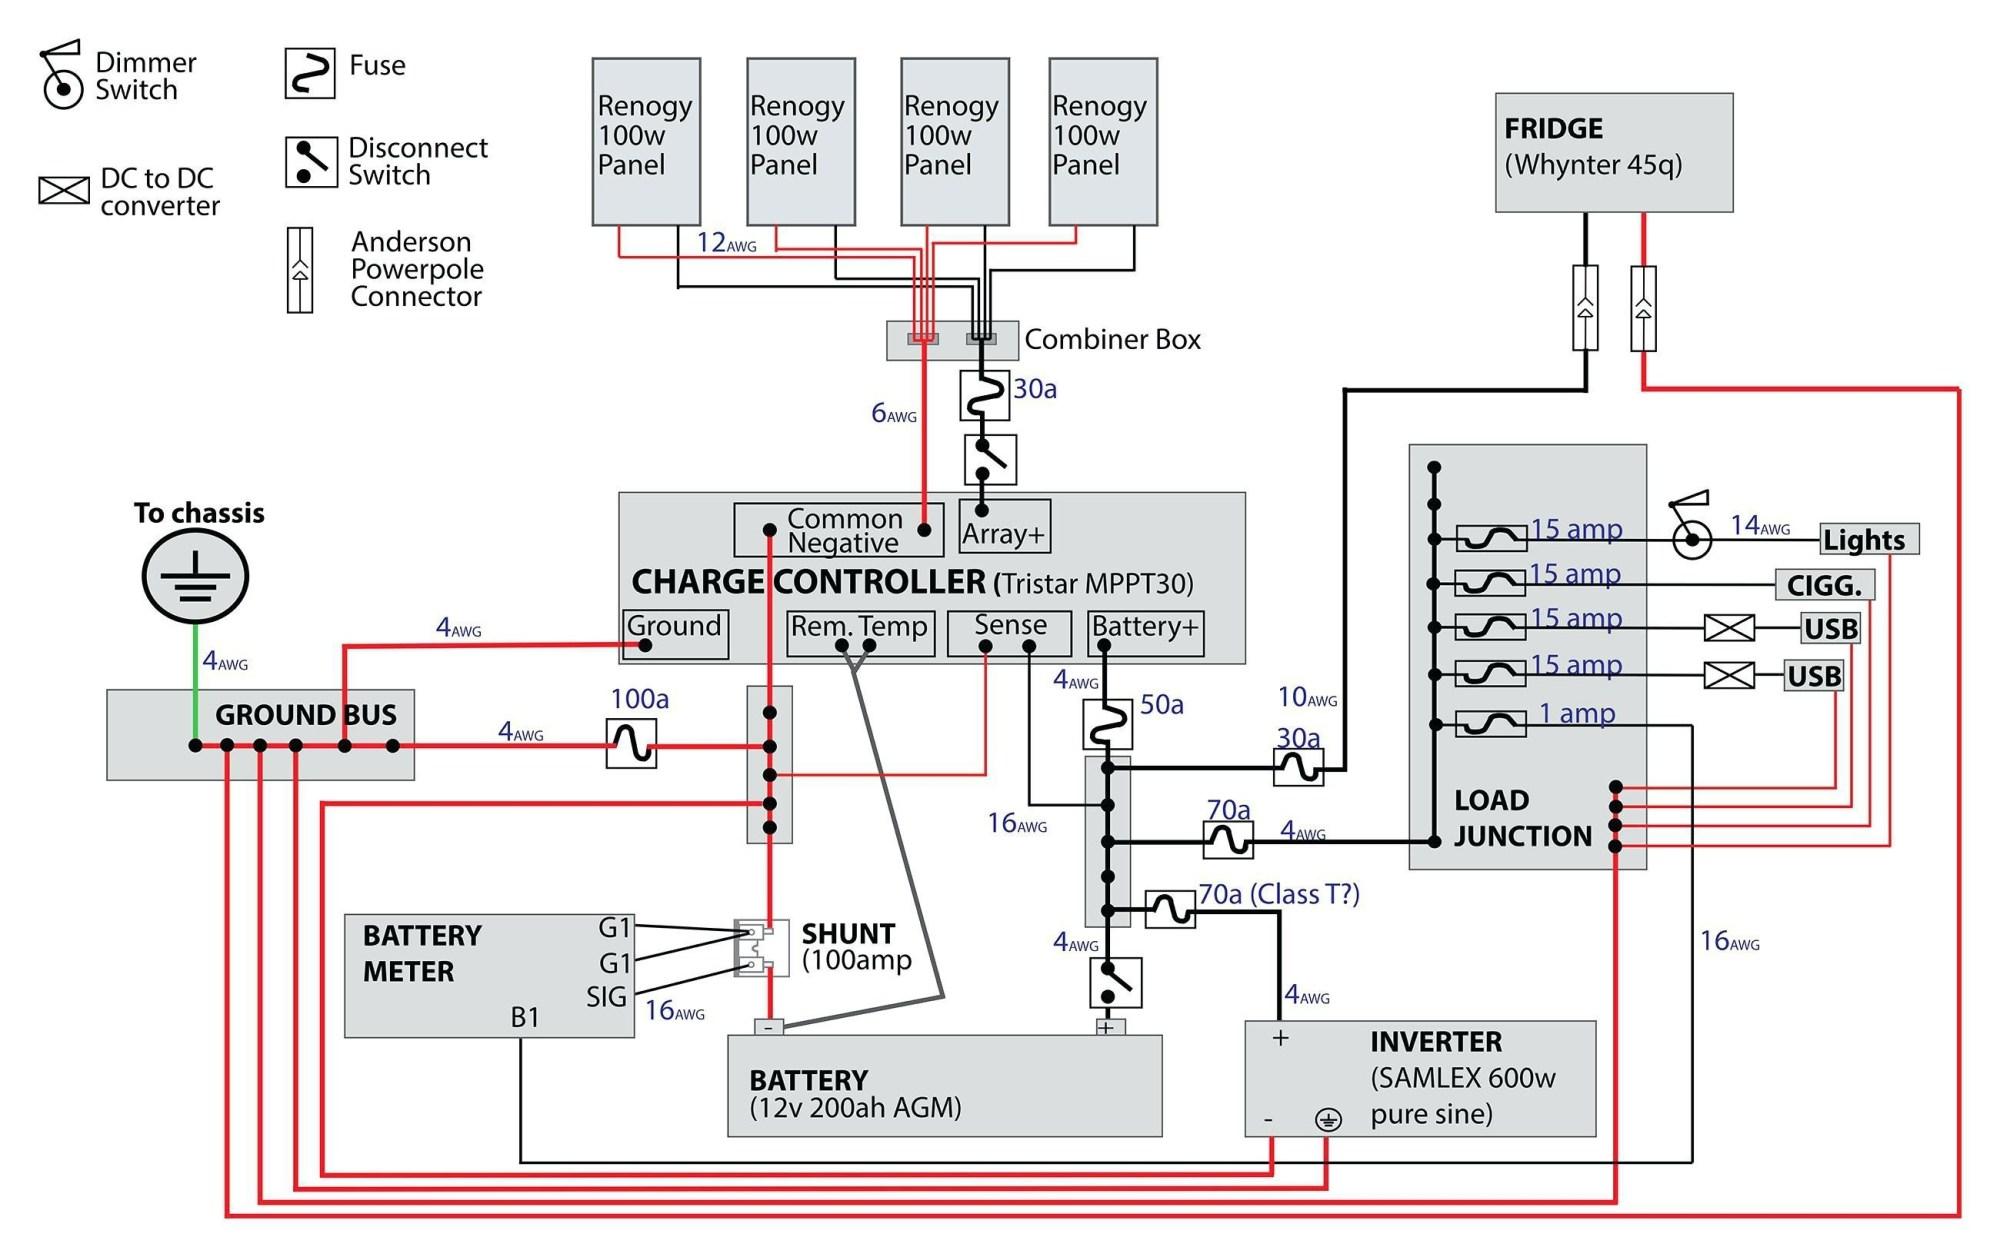 hight resolution of keystone rv wiring diagram coachman motorhome wiring diagram new keystone rv wiring diagram new coachman